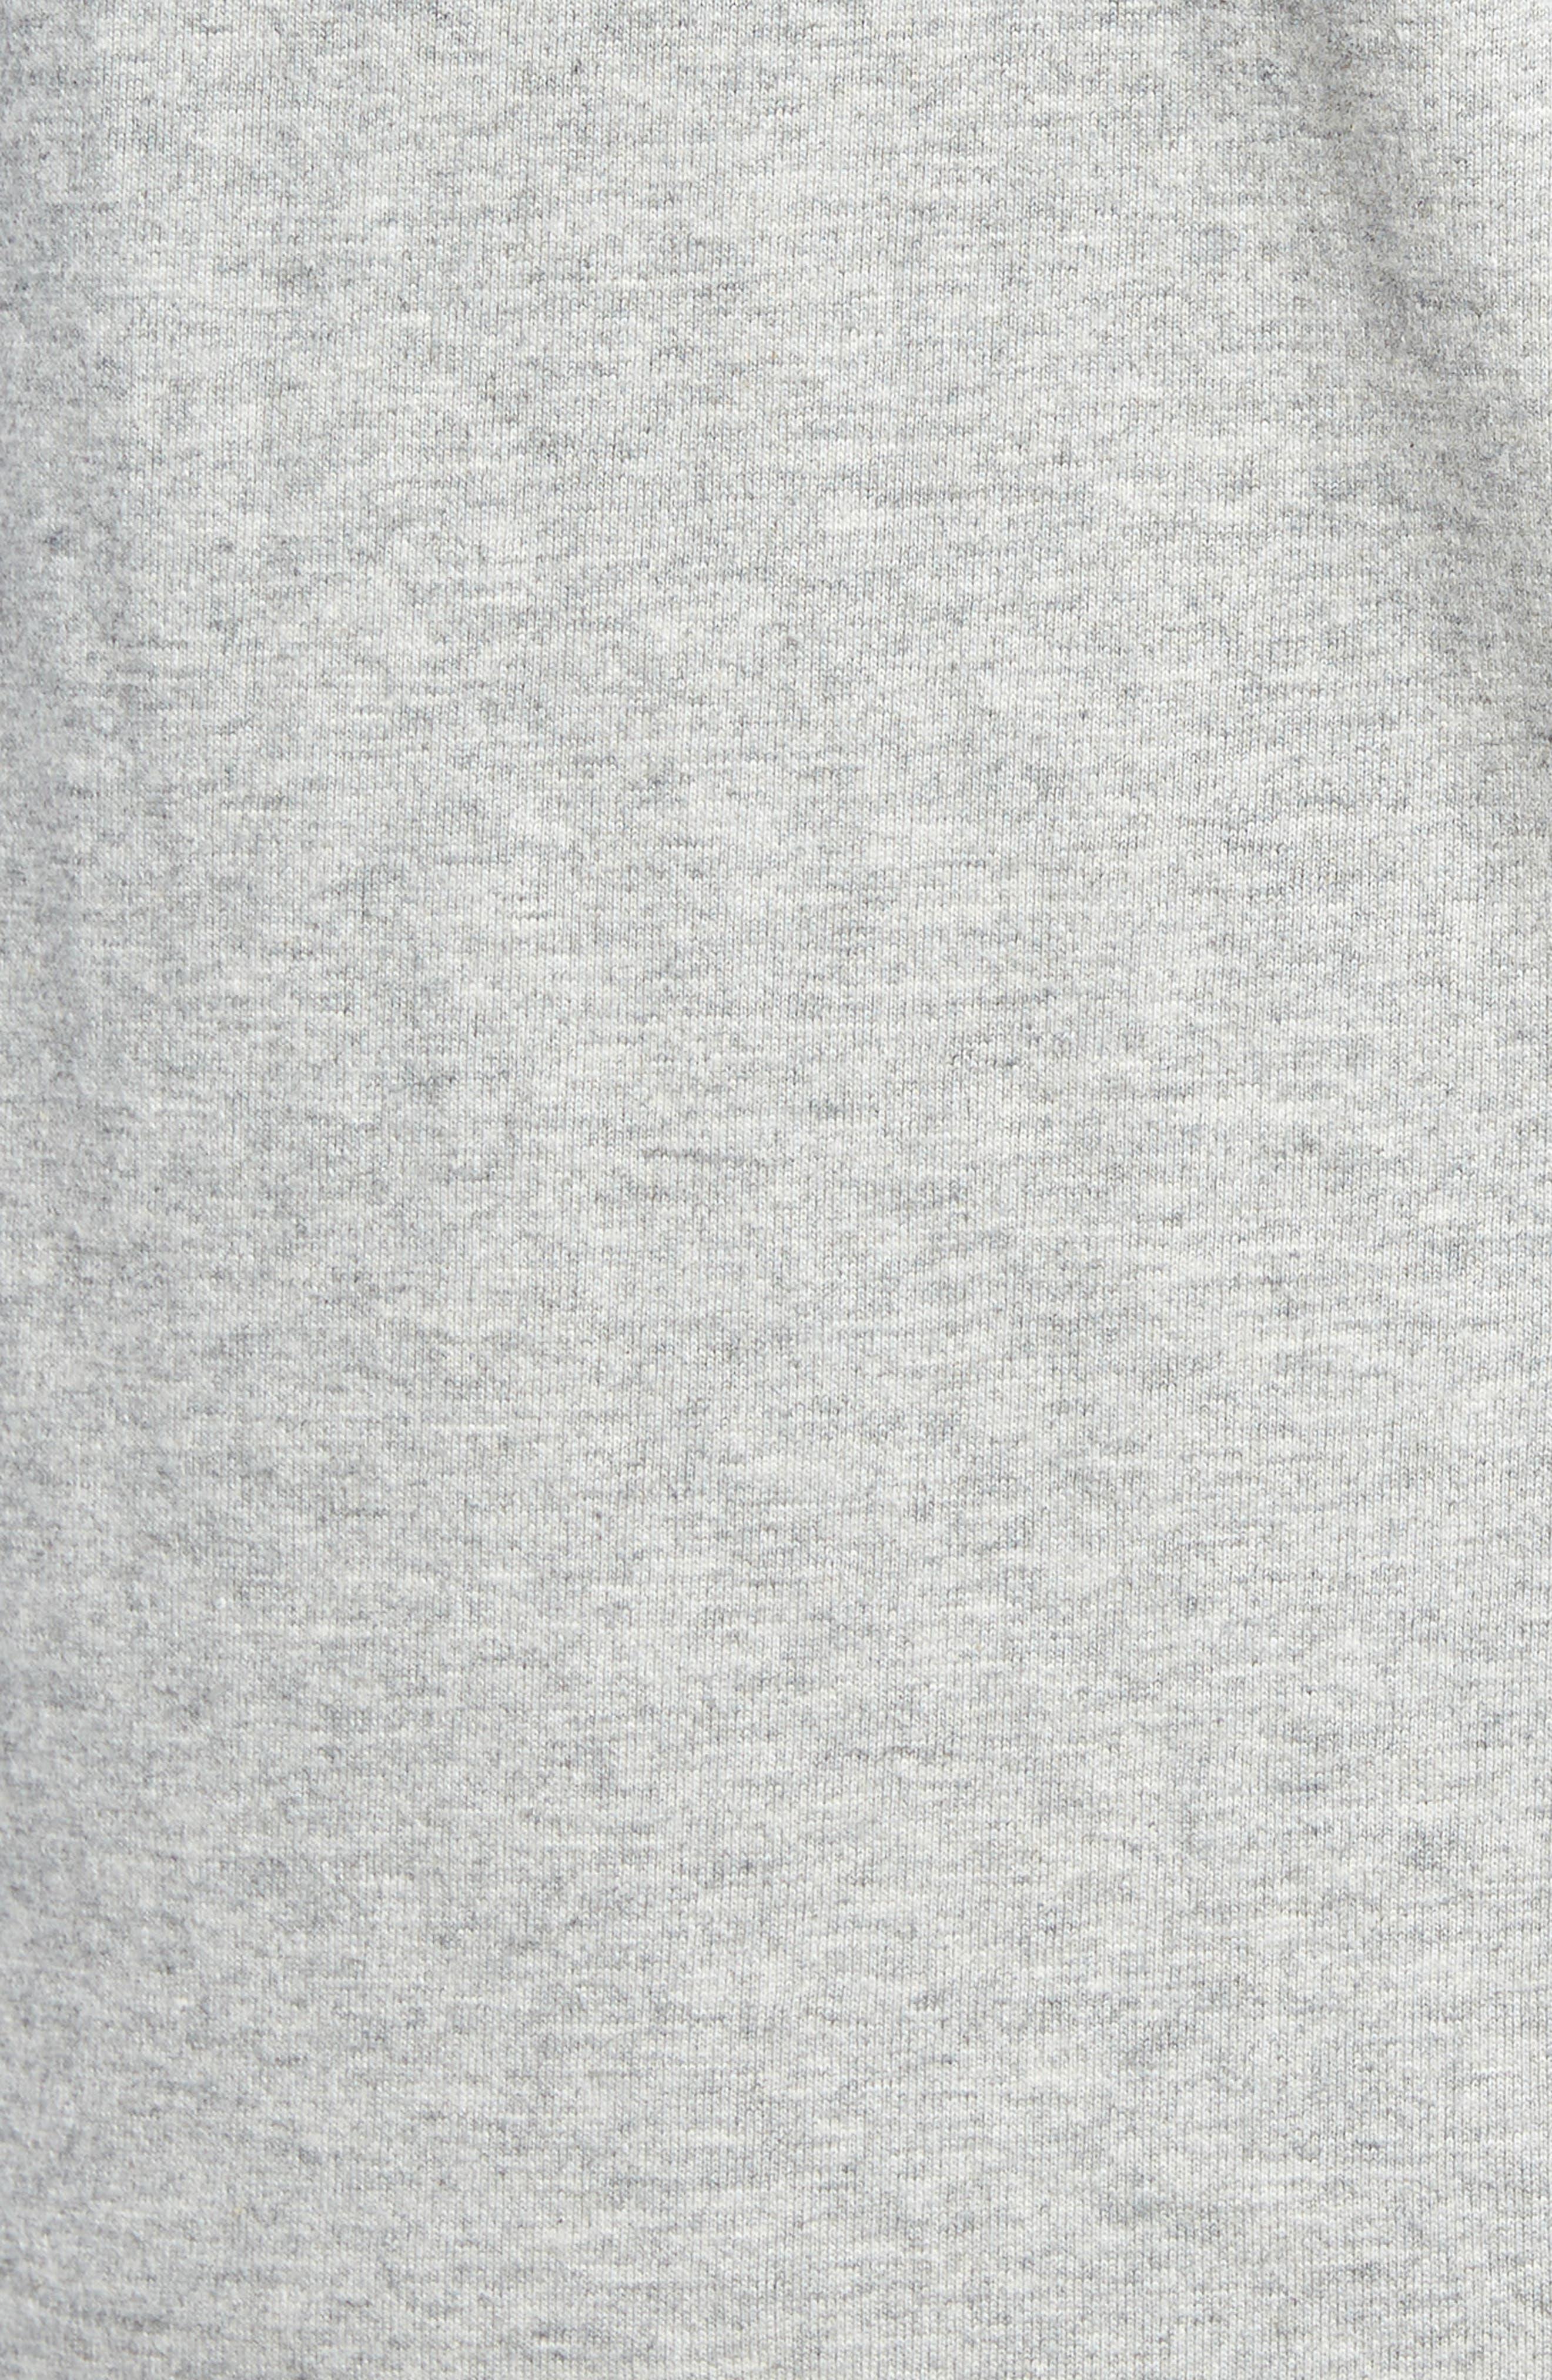 Denton Long Sleeve Henley,                             Alternate thumbnail 5, color,                             CEMENT HEATHER/ PORT ROYALE